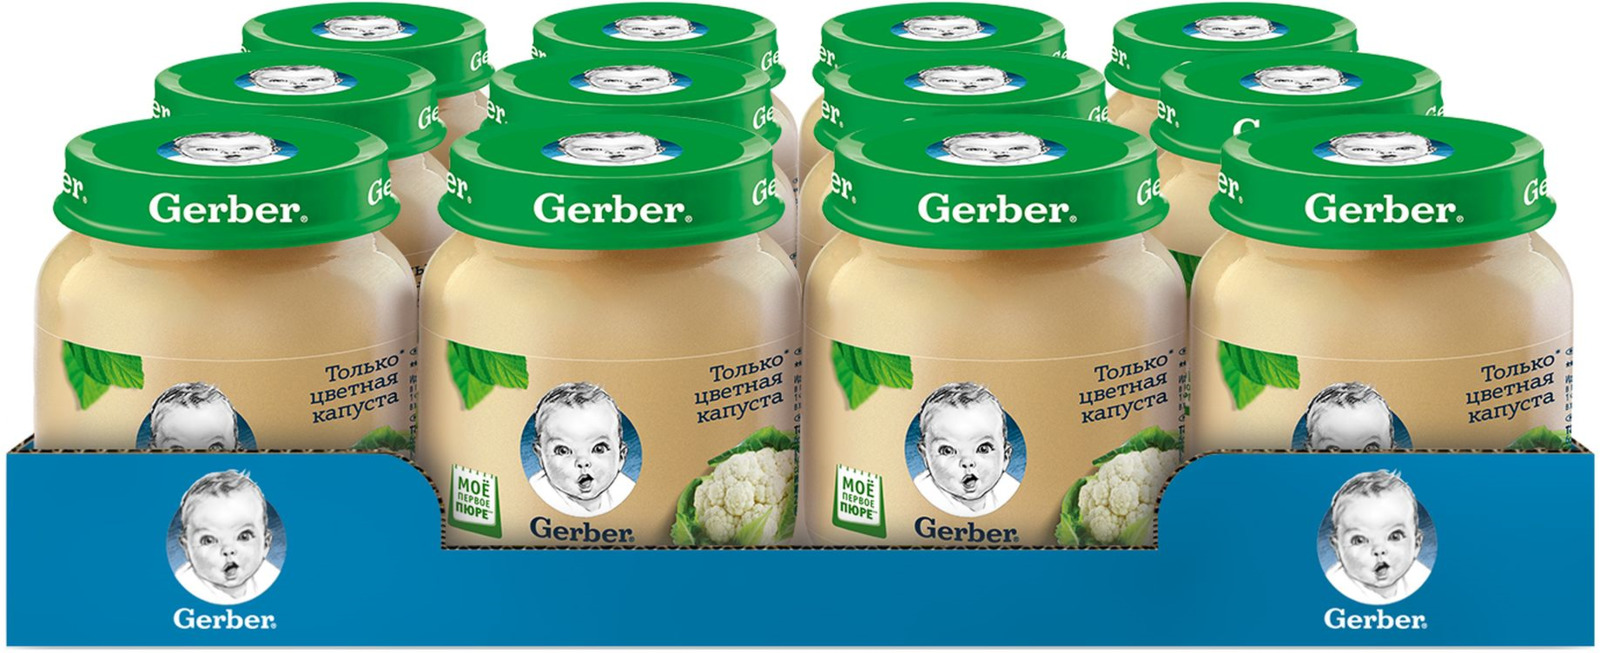 Gerber пюре Цветная Капуста с 4 месяцев, 12 шт по 130 г пюре gerber цветная капуста и картофель с 5 мес 130 гр